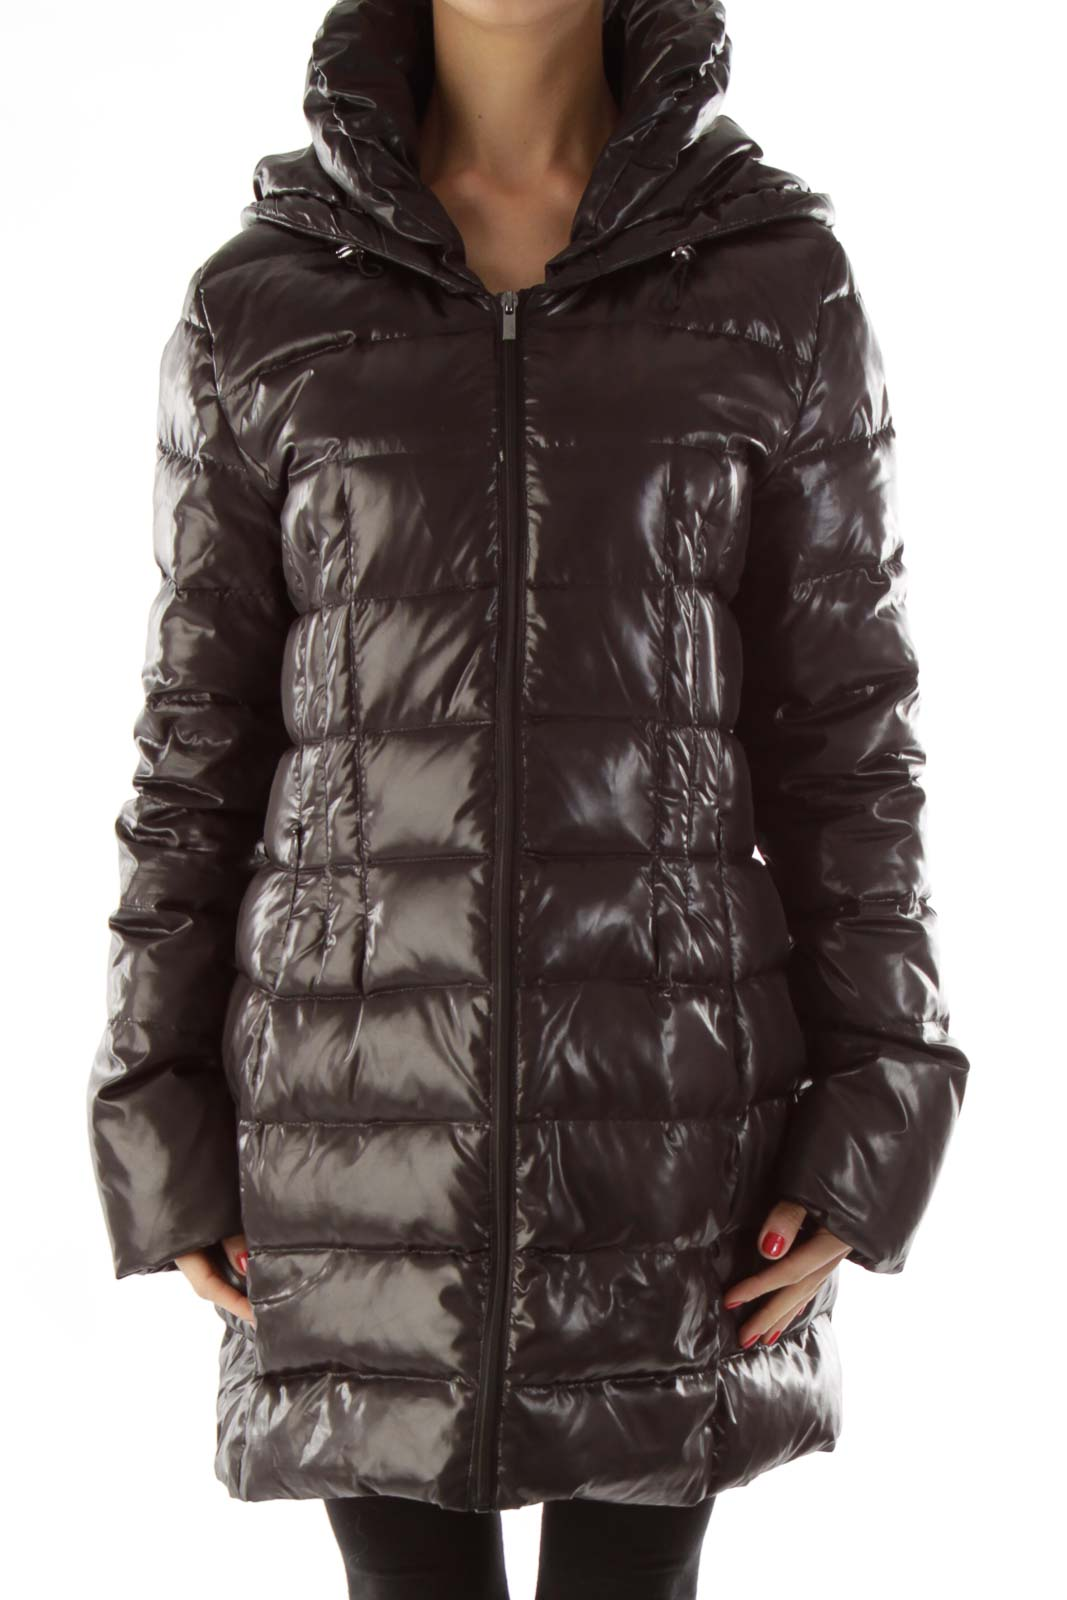 Black Puffy Hooded Jacket